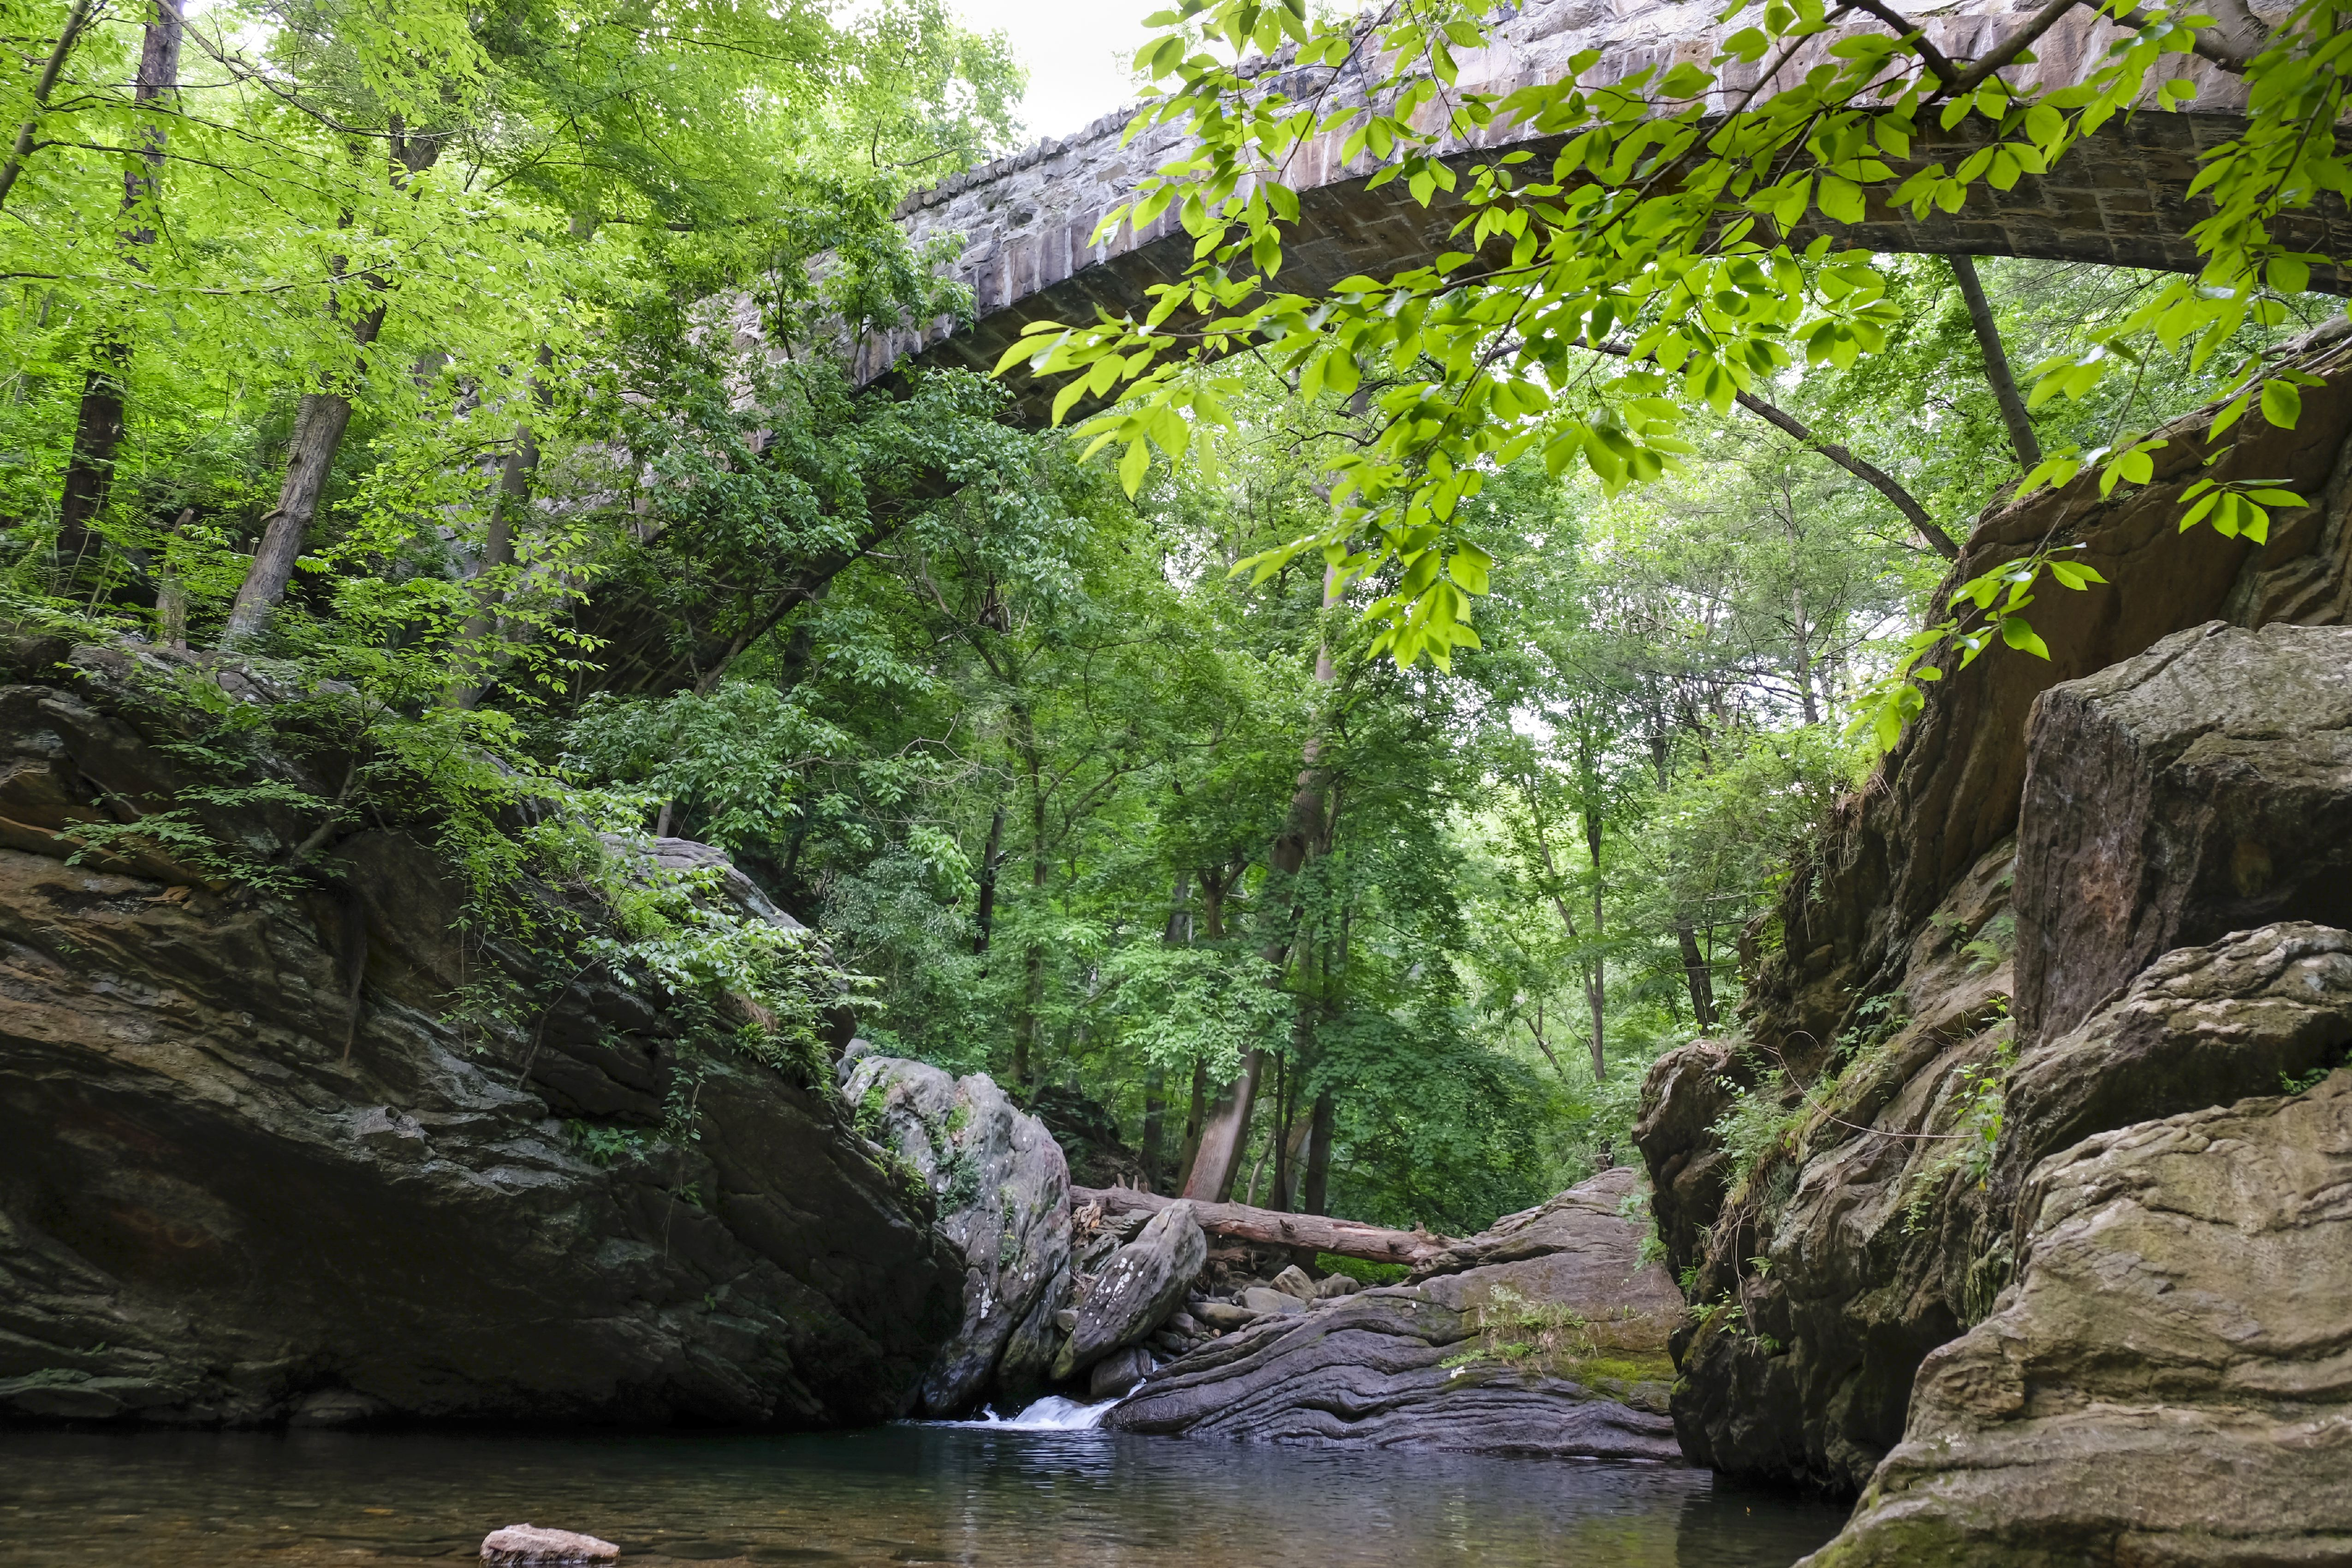 Devils Pool swimming hole and Cresheim Creek in Wissahickon Creek Valley Park, Northwest Philadelphia, Pennsylvania